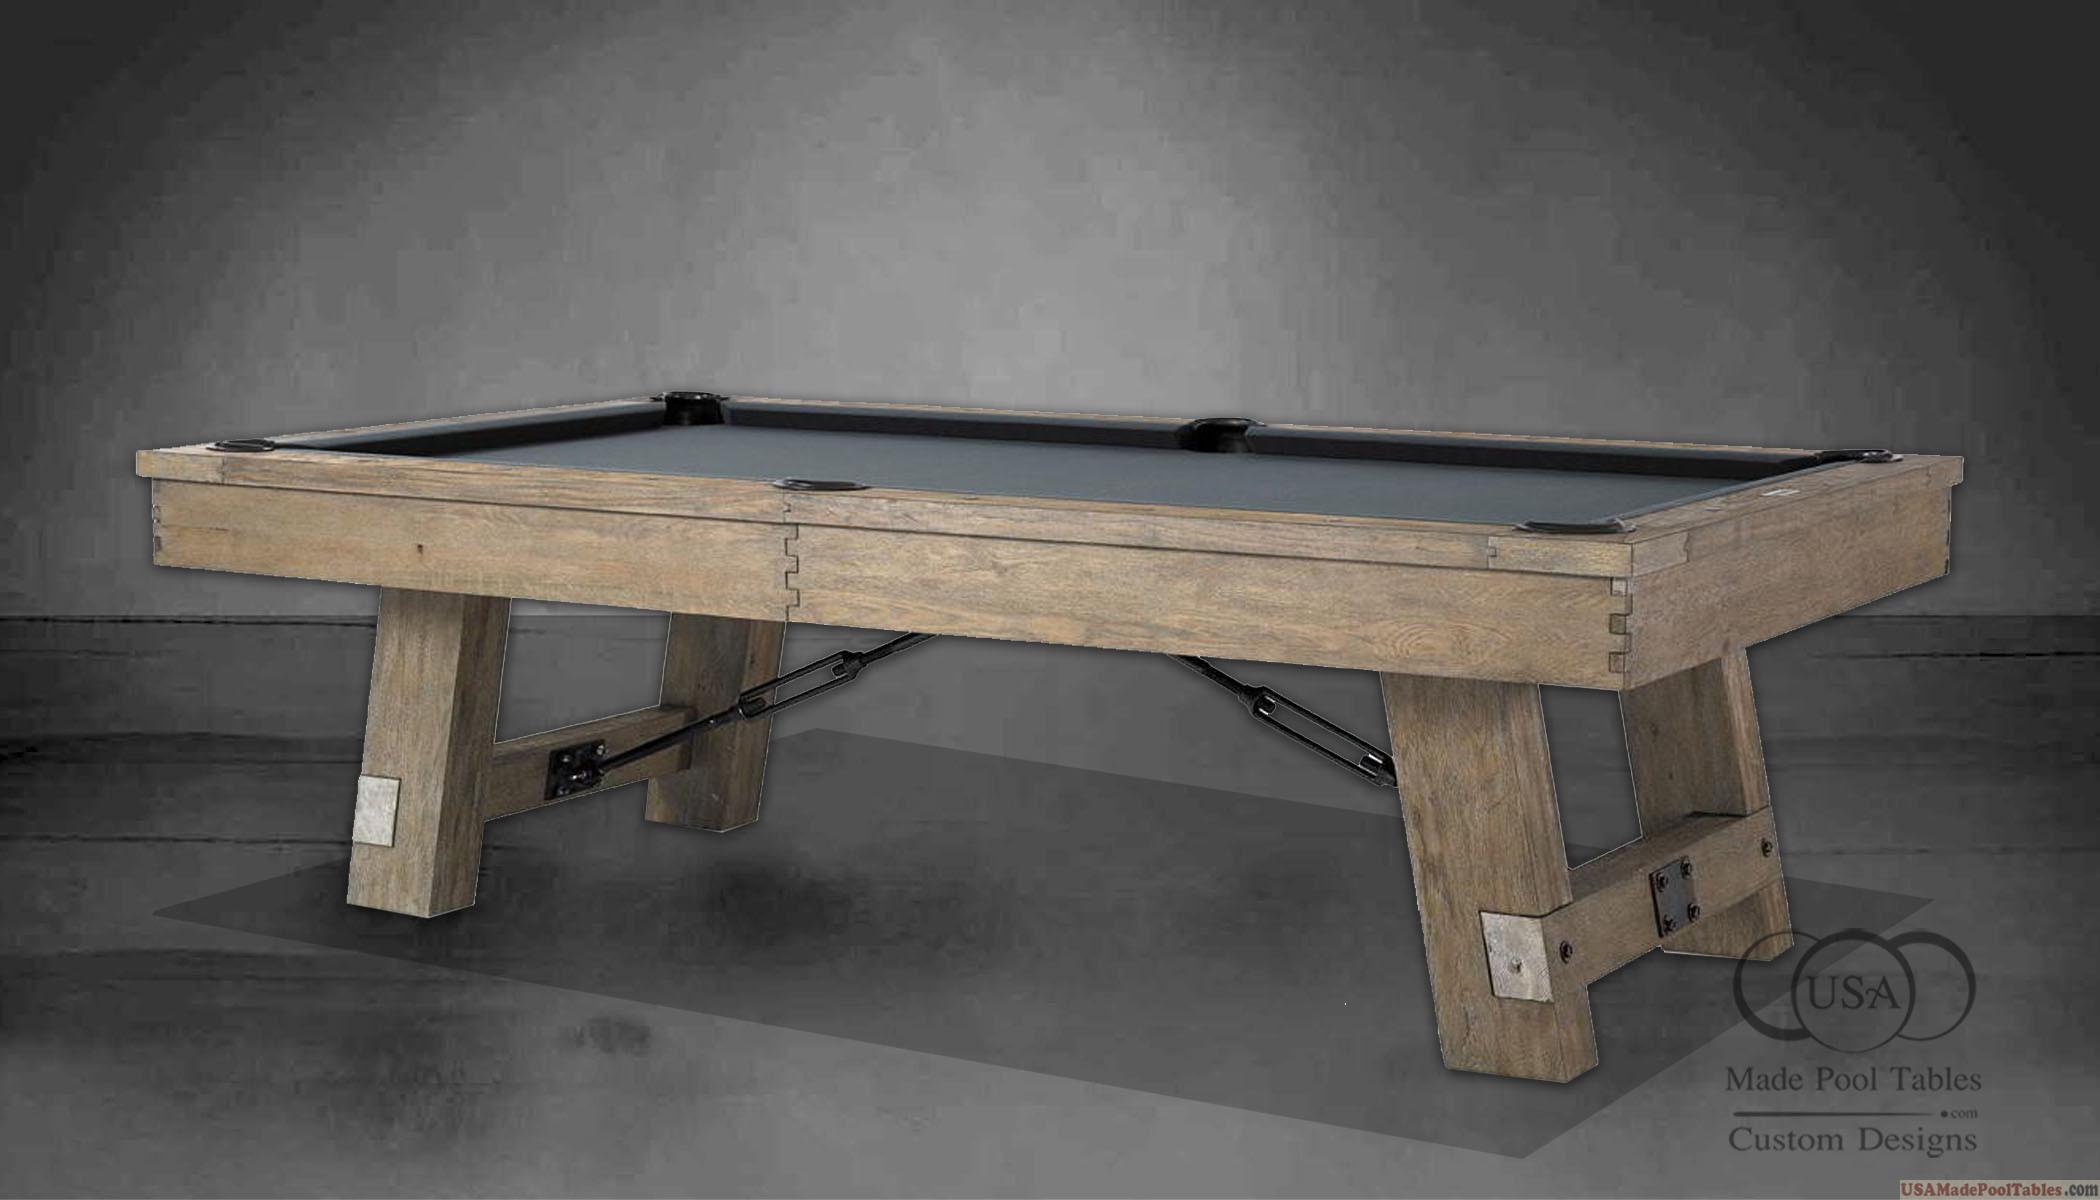 Rustic Billiard Tables Rustic Pool Tables Rustic Pool